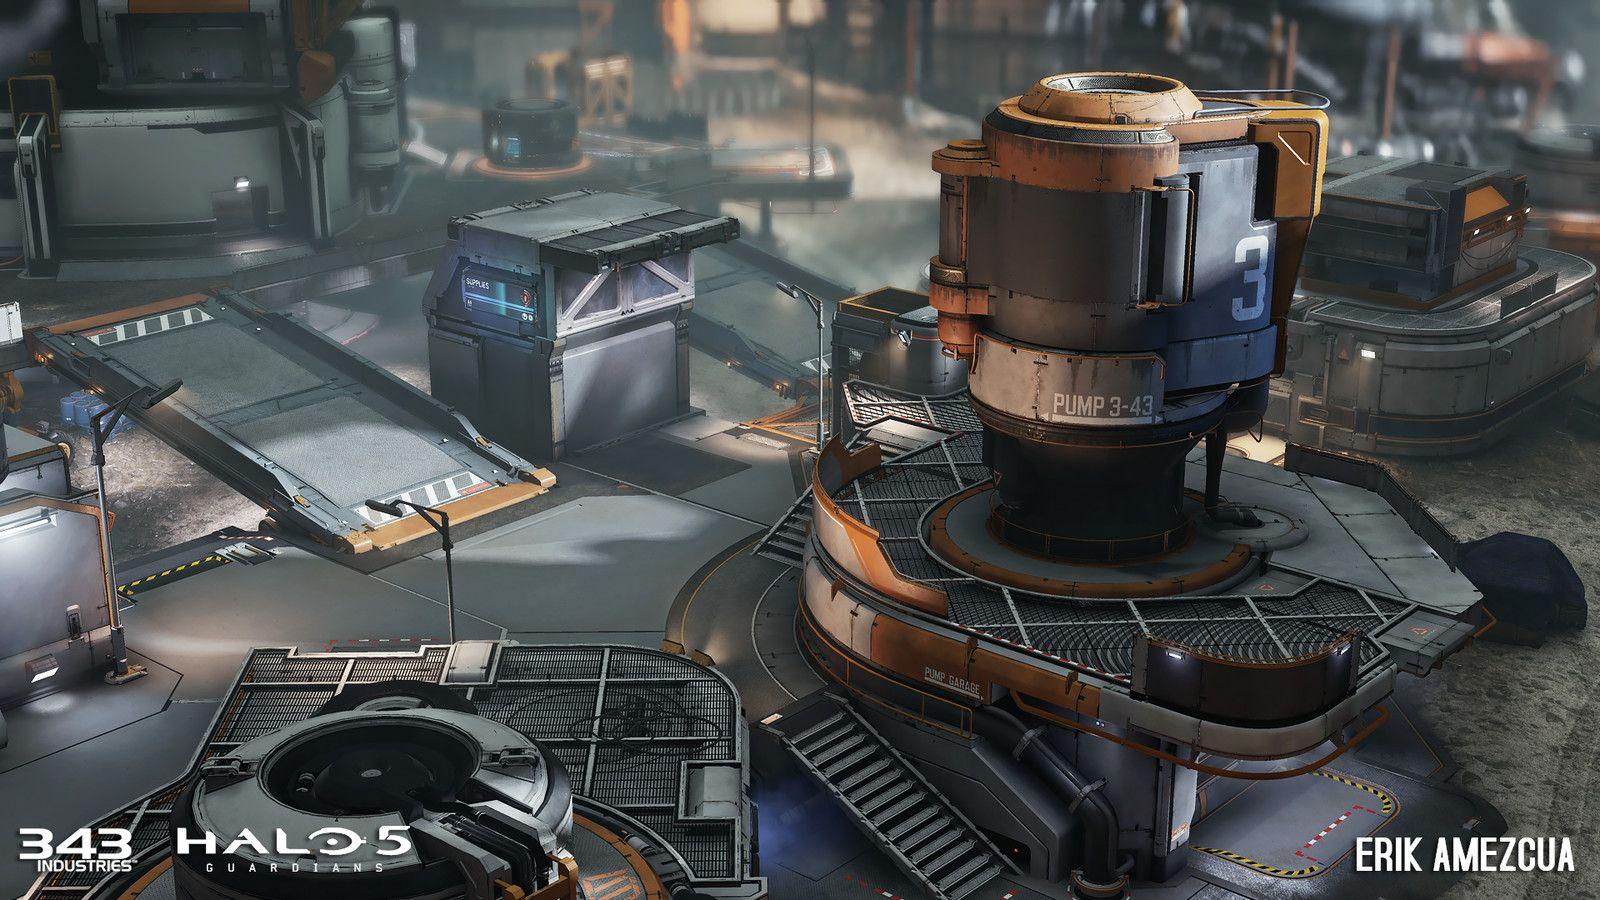 Halo 5: Guardians - Prospect, Erik Amezcua on ArtStation at https://www.artstation.com/artwork/QoJad